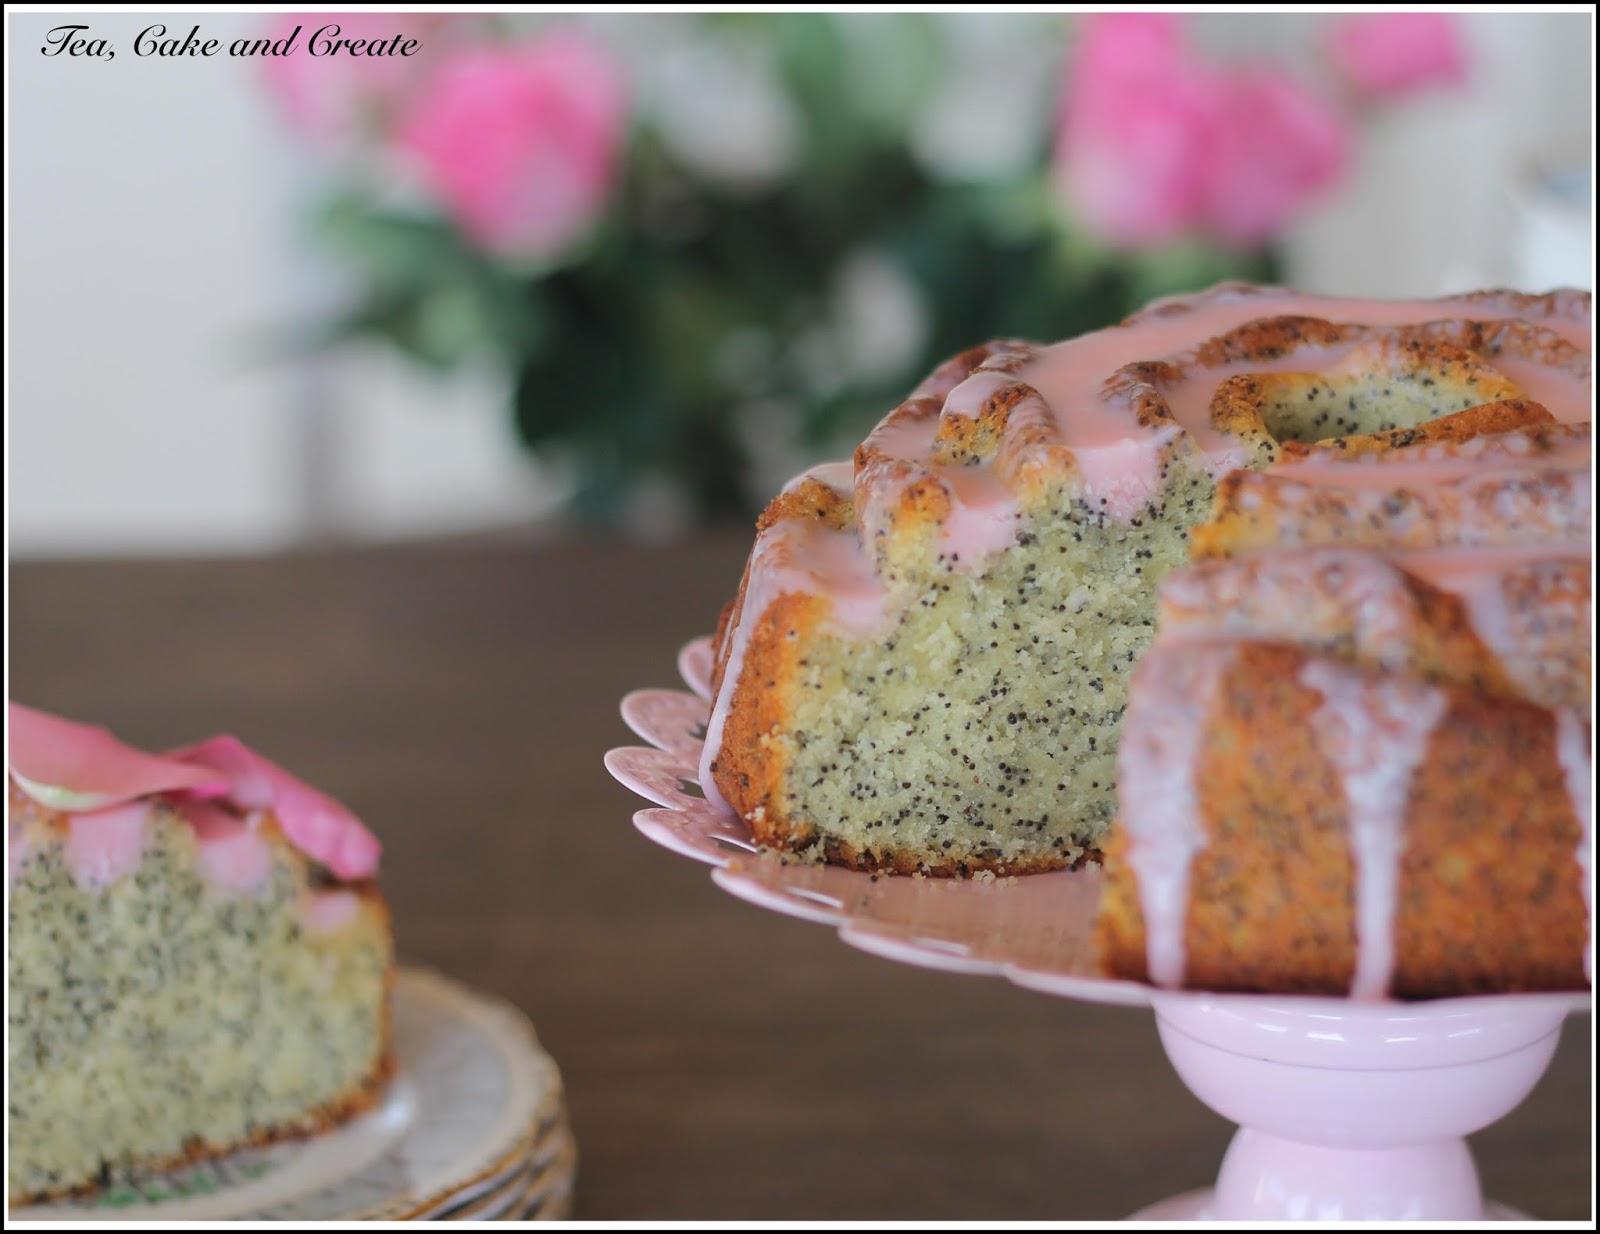 Tea, Cake & Create: Rose Water and Poppyseed Cake